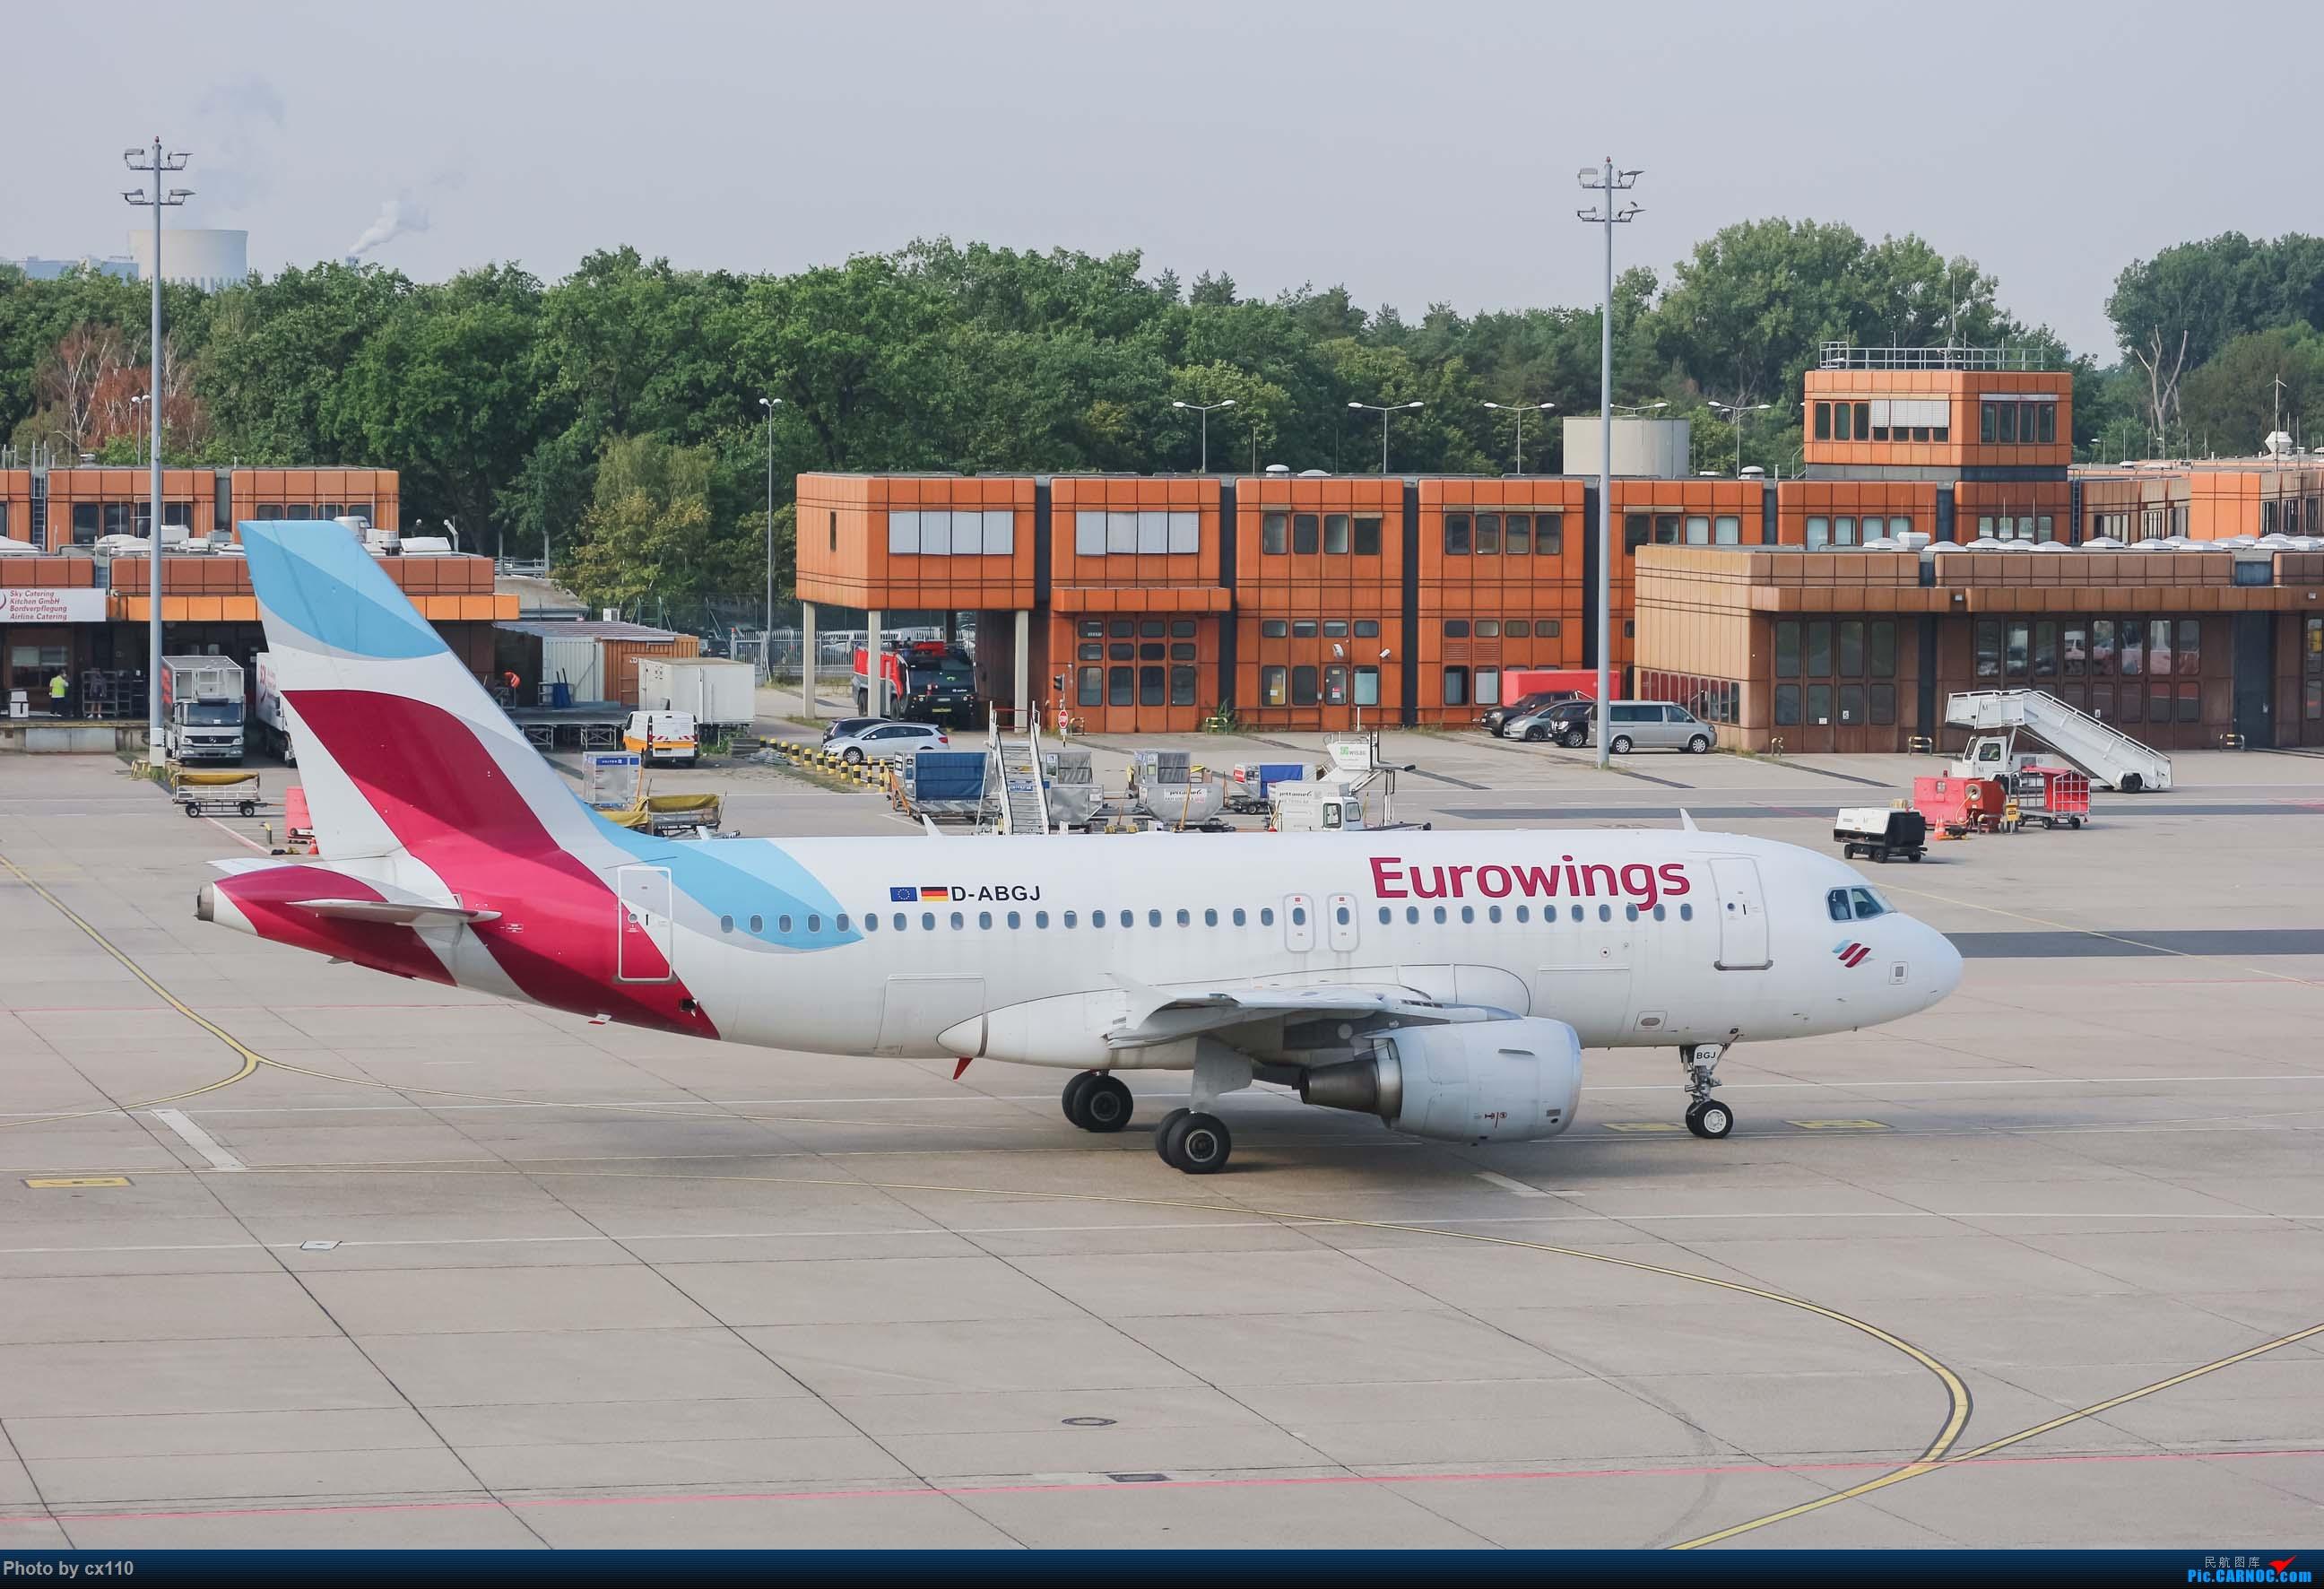 Re:[原创]欧洲机场拍机记-柏林/赫尔辛基/布拉格 AIRBUS A319 D-ABGJ 德国柏林泰格尔机场